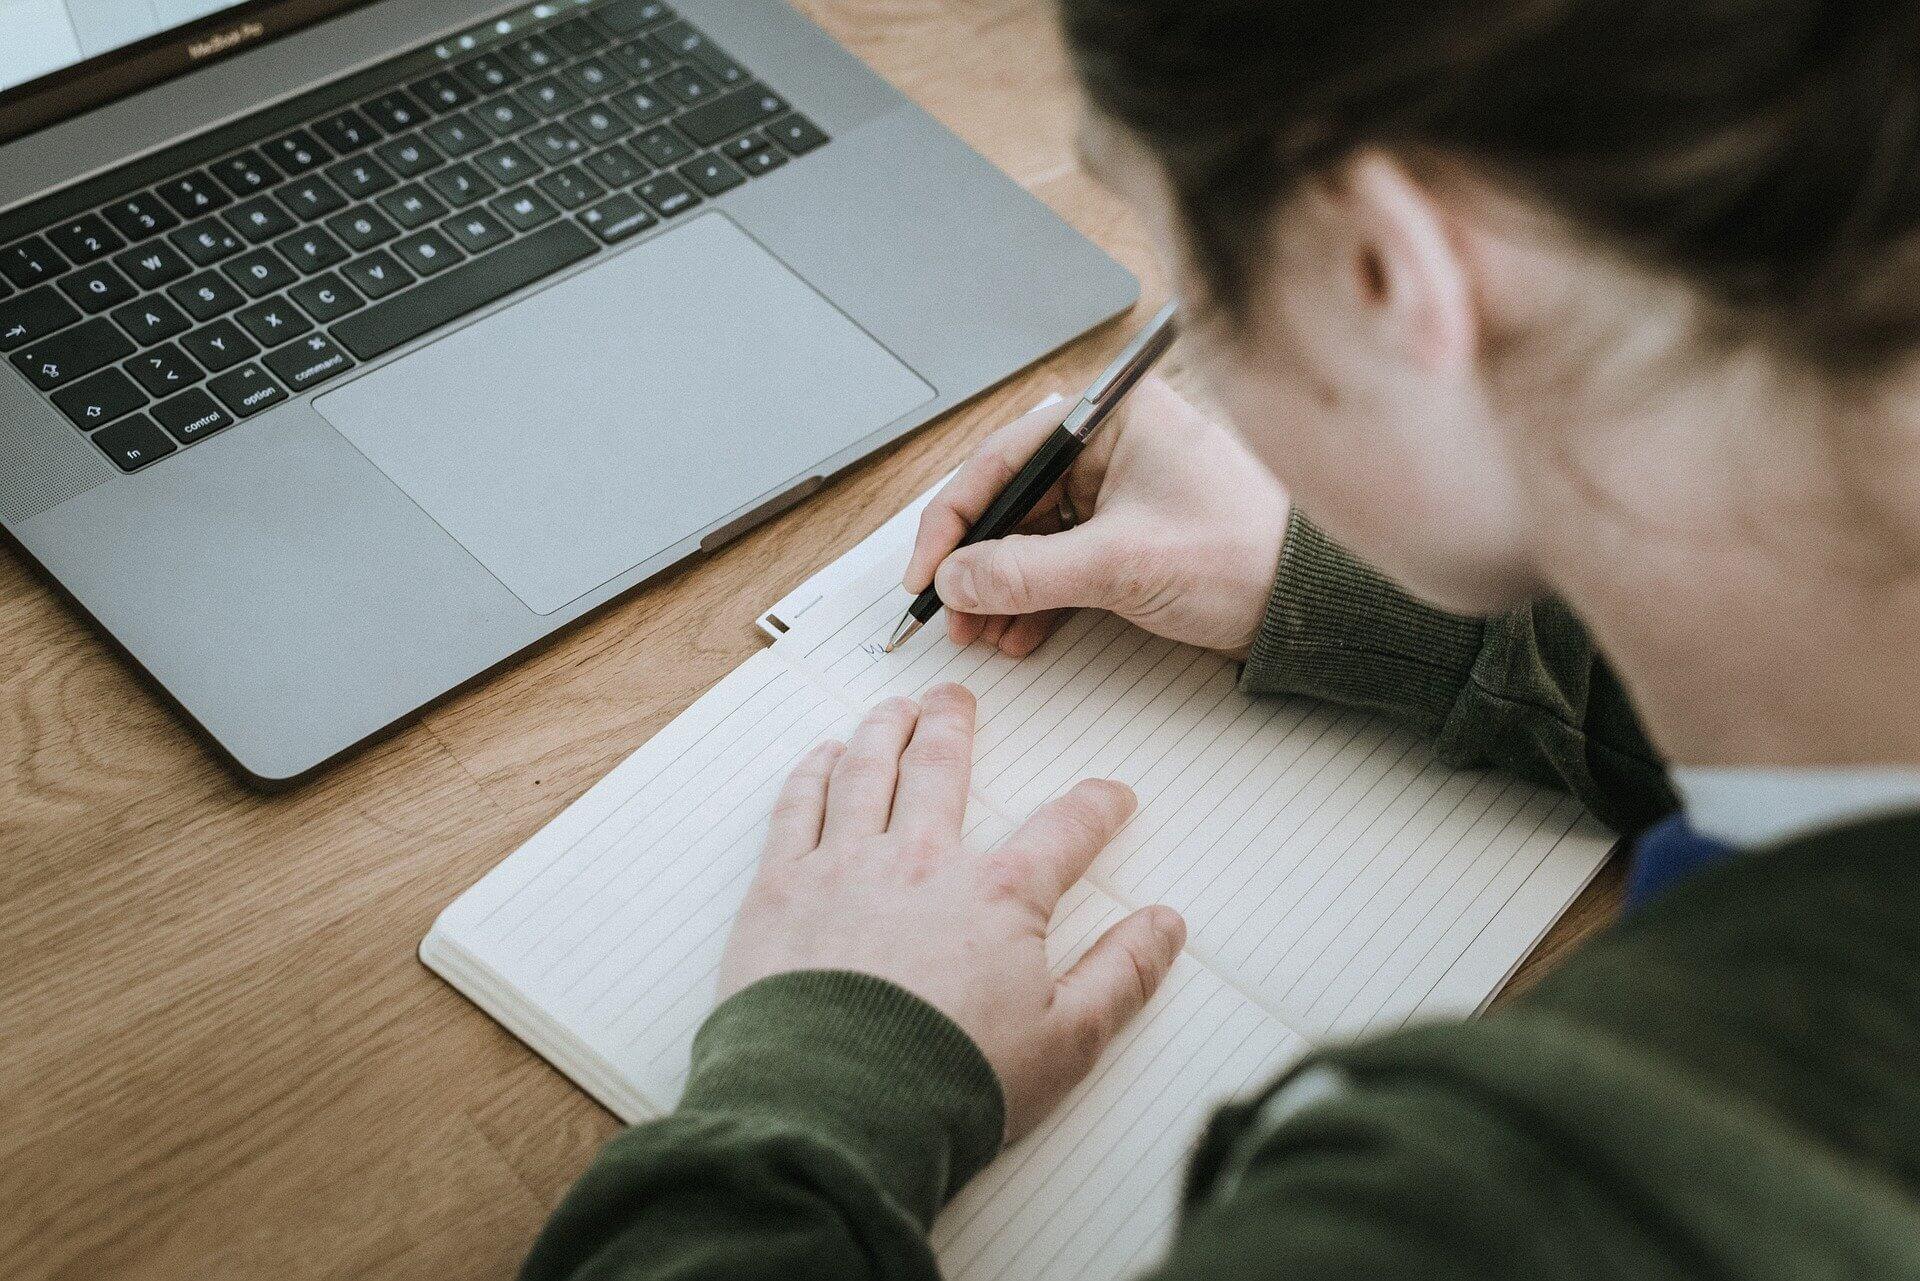 webデザイン、スクール、学ぶ2−5